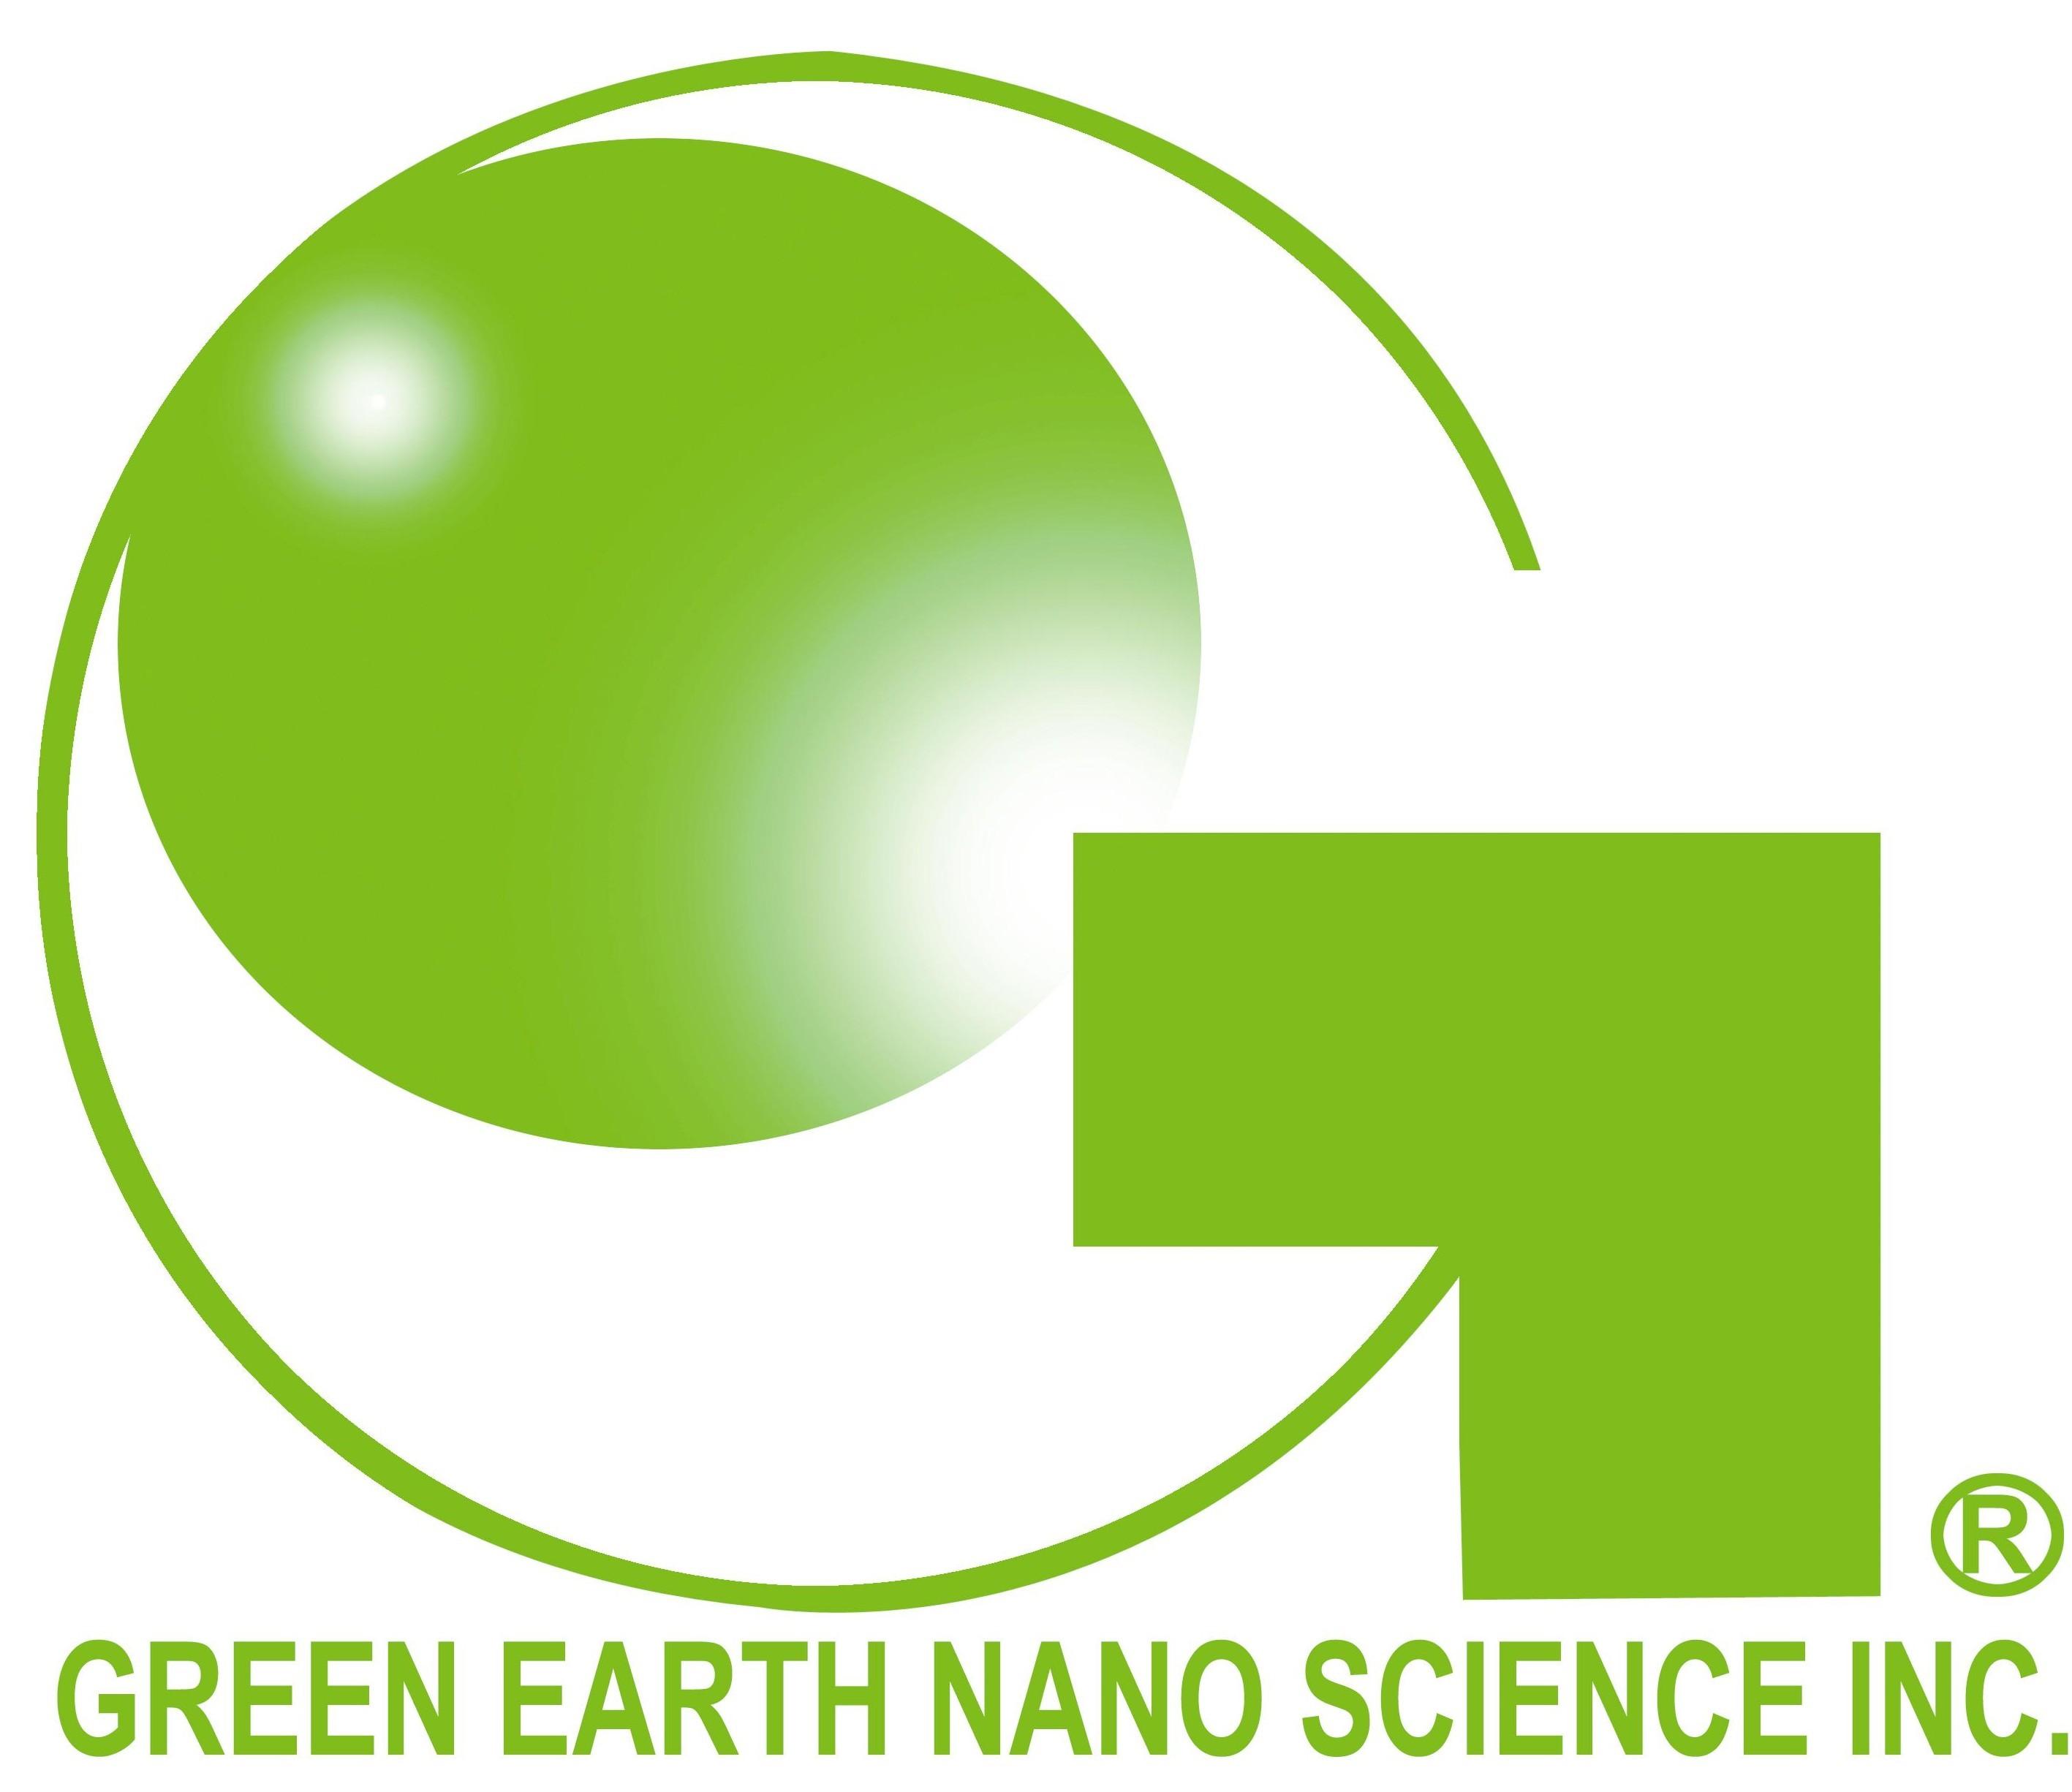 Green Earth Nano Science Inc.